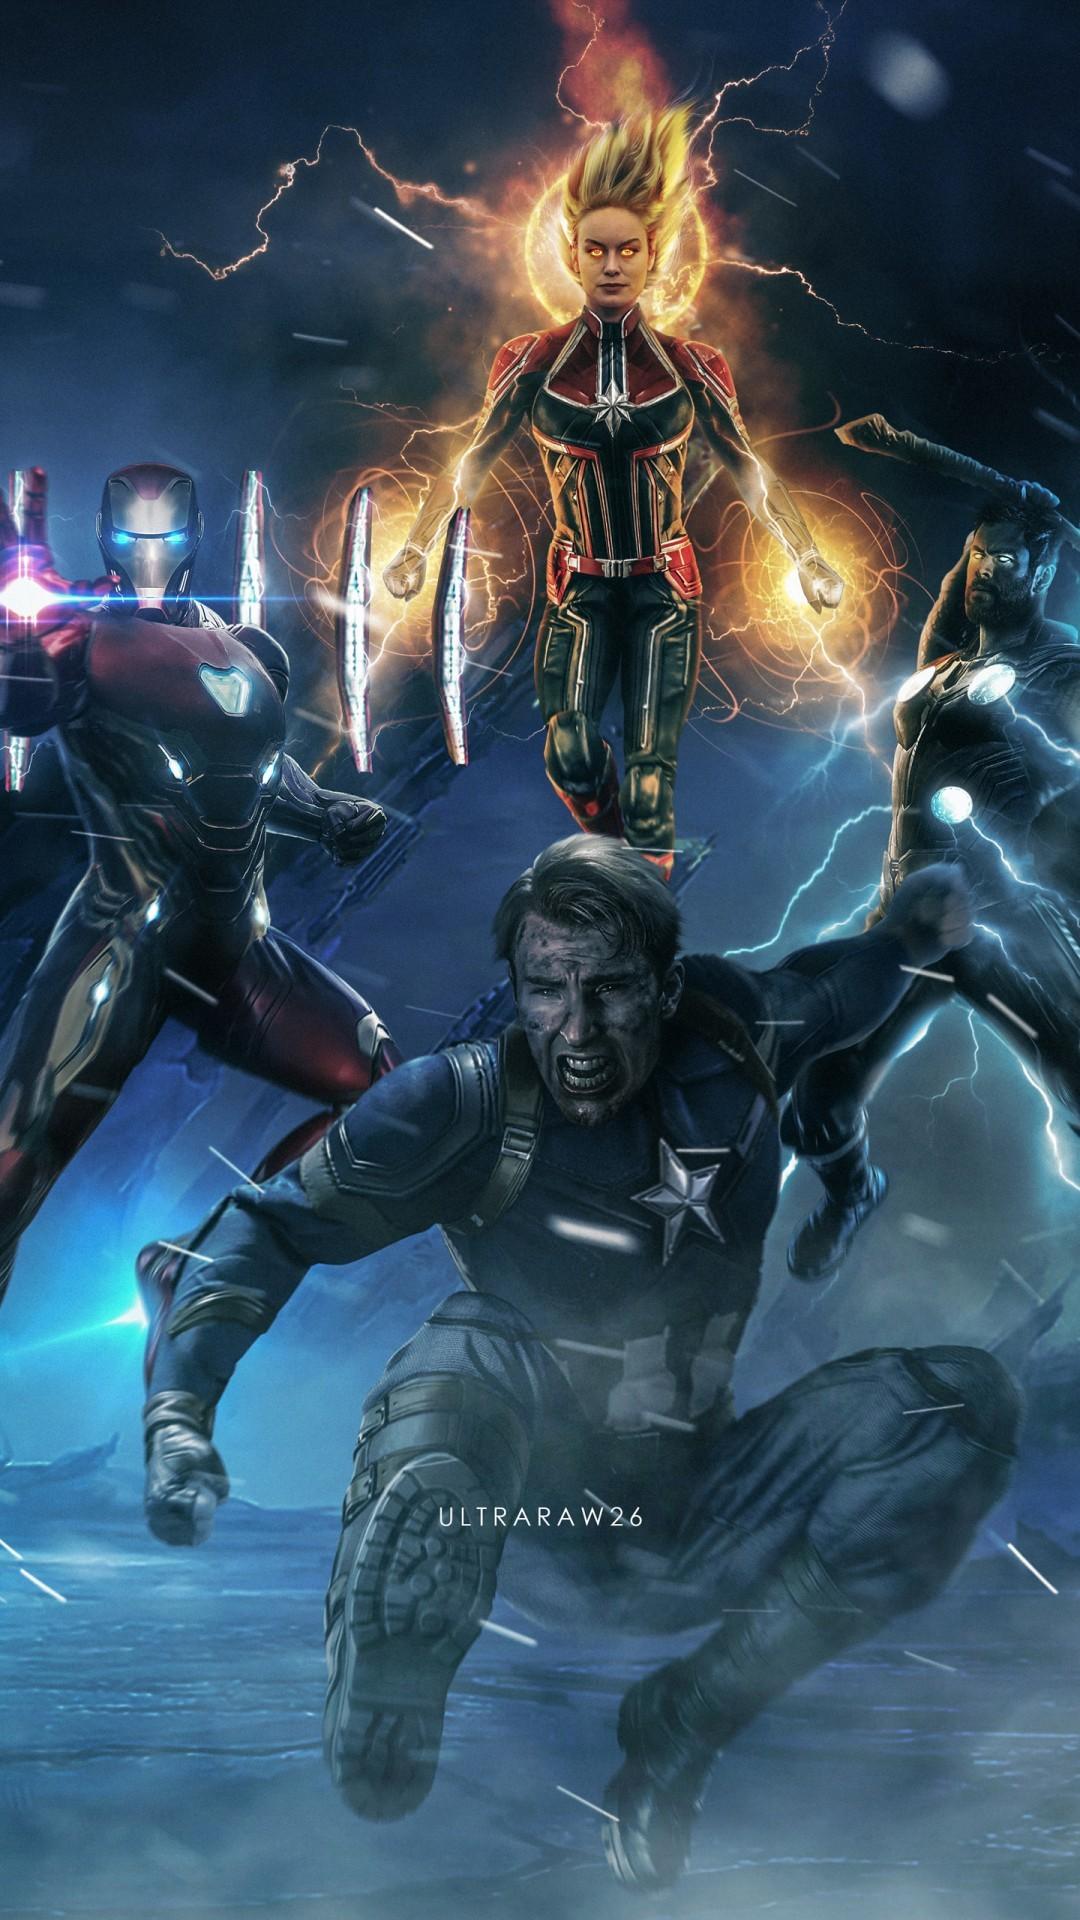 Free Avengers 4 Endgame Superheroes phone wallpaper by perez12